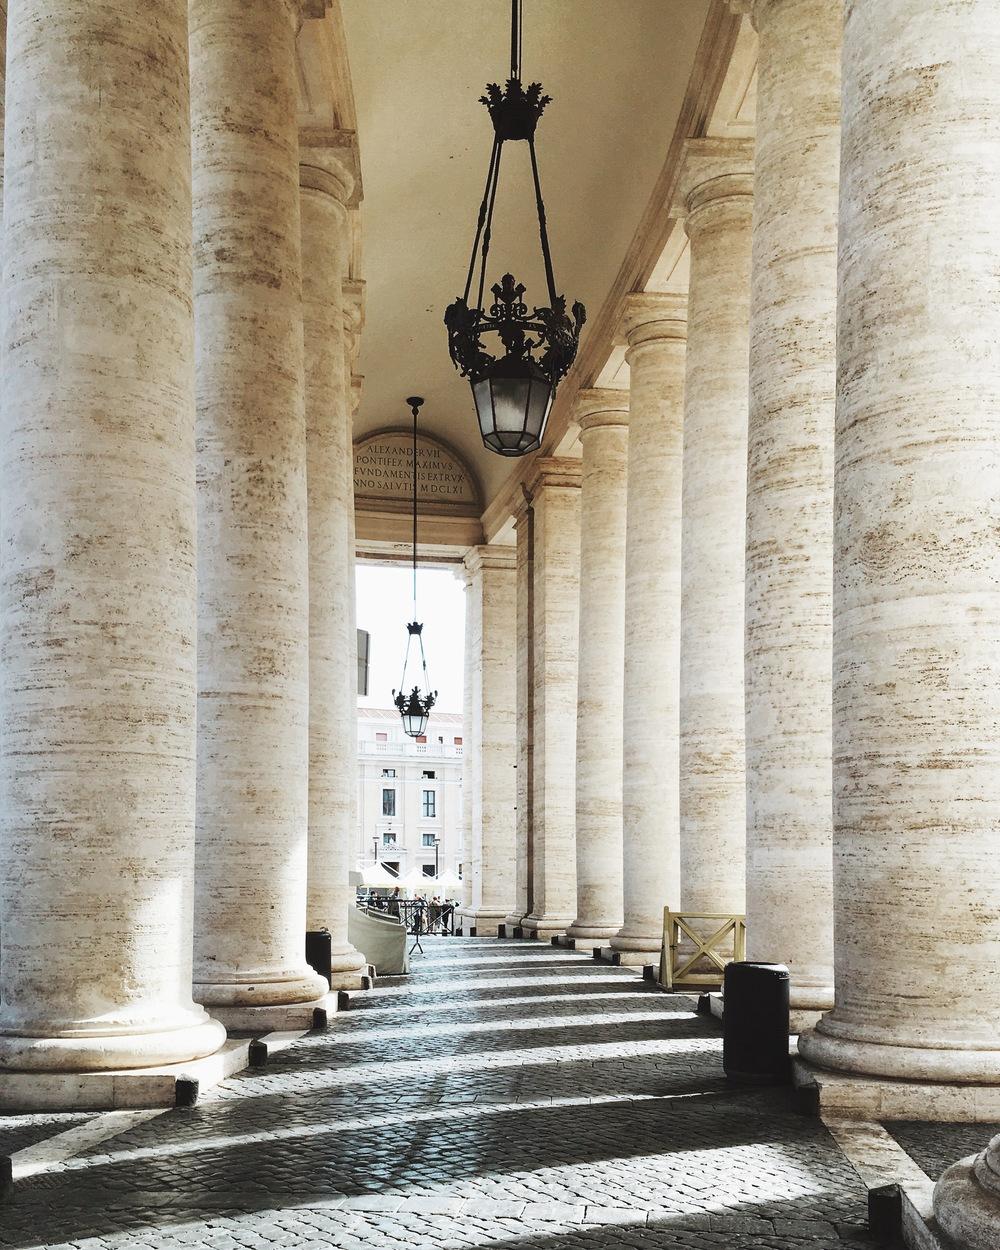 Rome_2016_helena melikov_3.jpeg